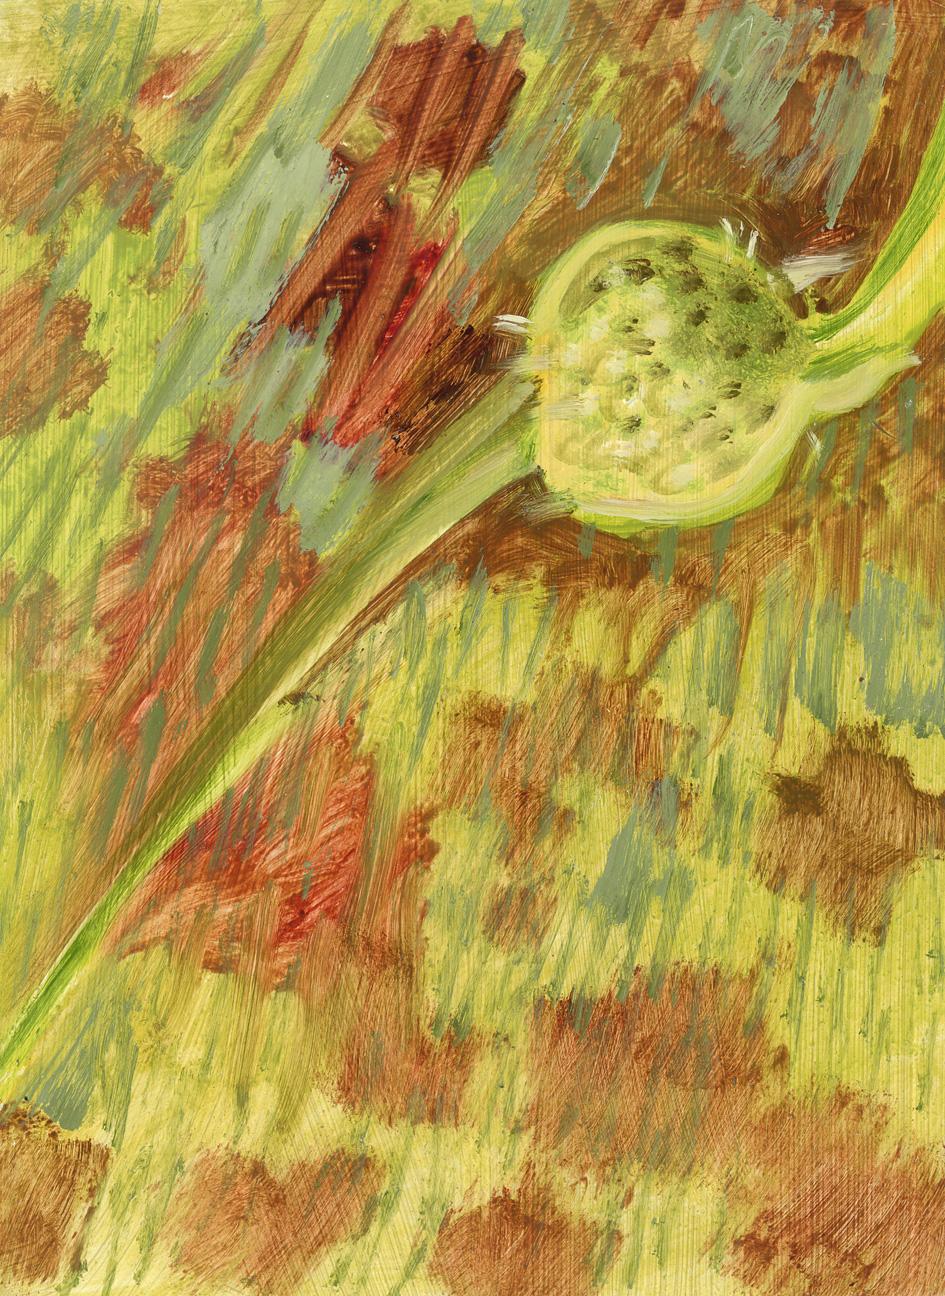 Green Seedhead